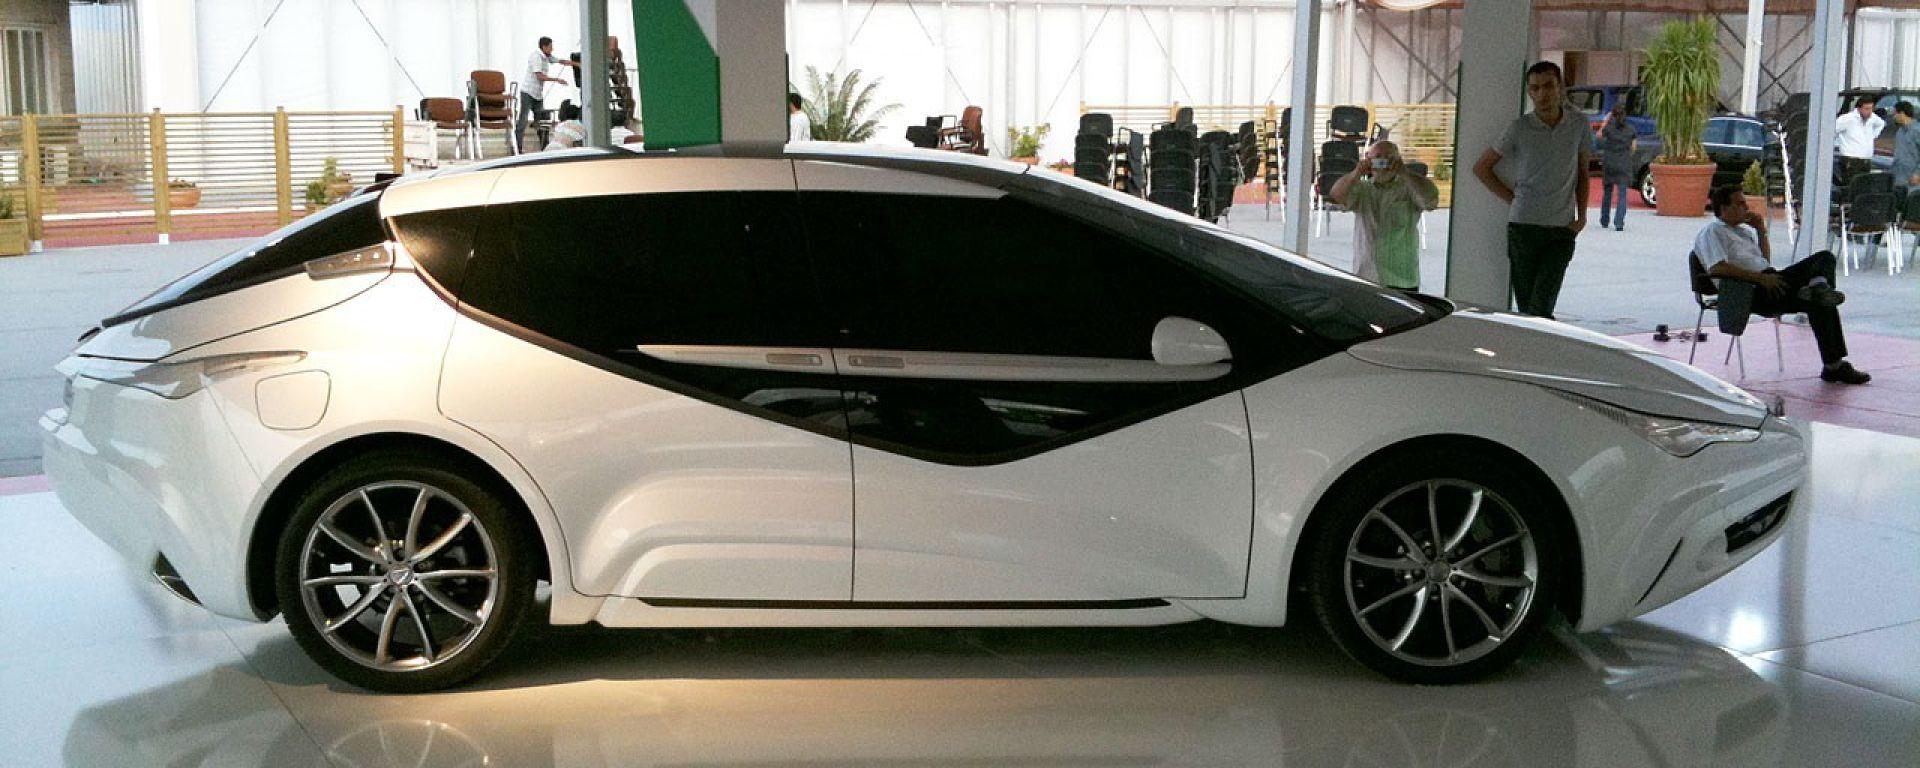 Tesco TS Rockets, l'auto disegnata da Gheddafi